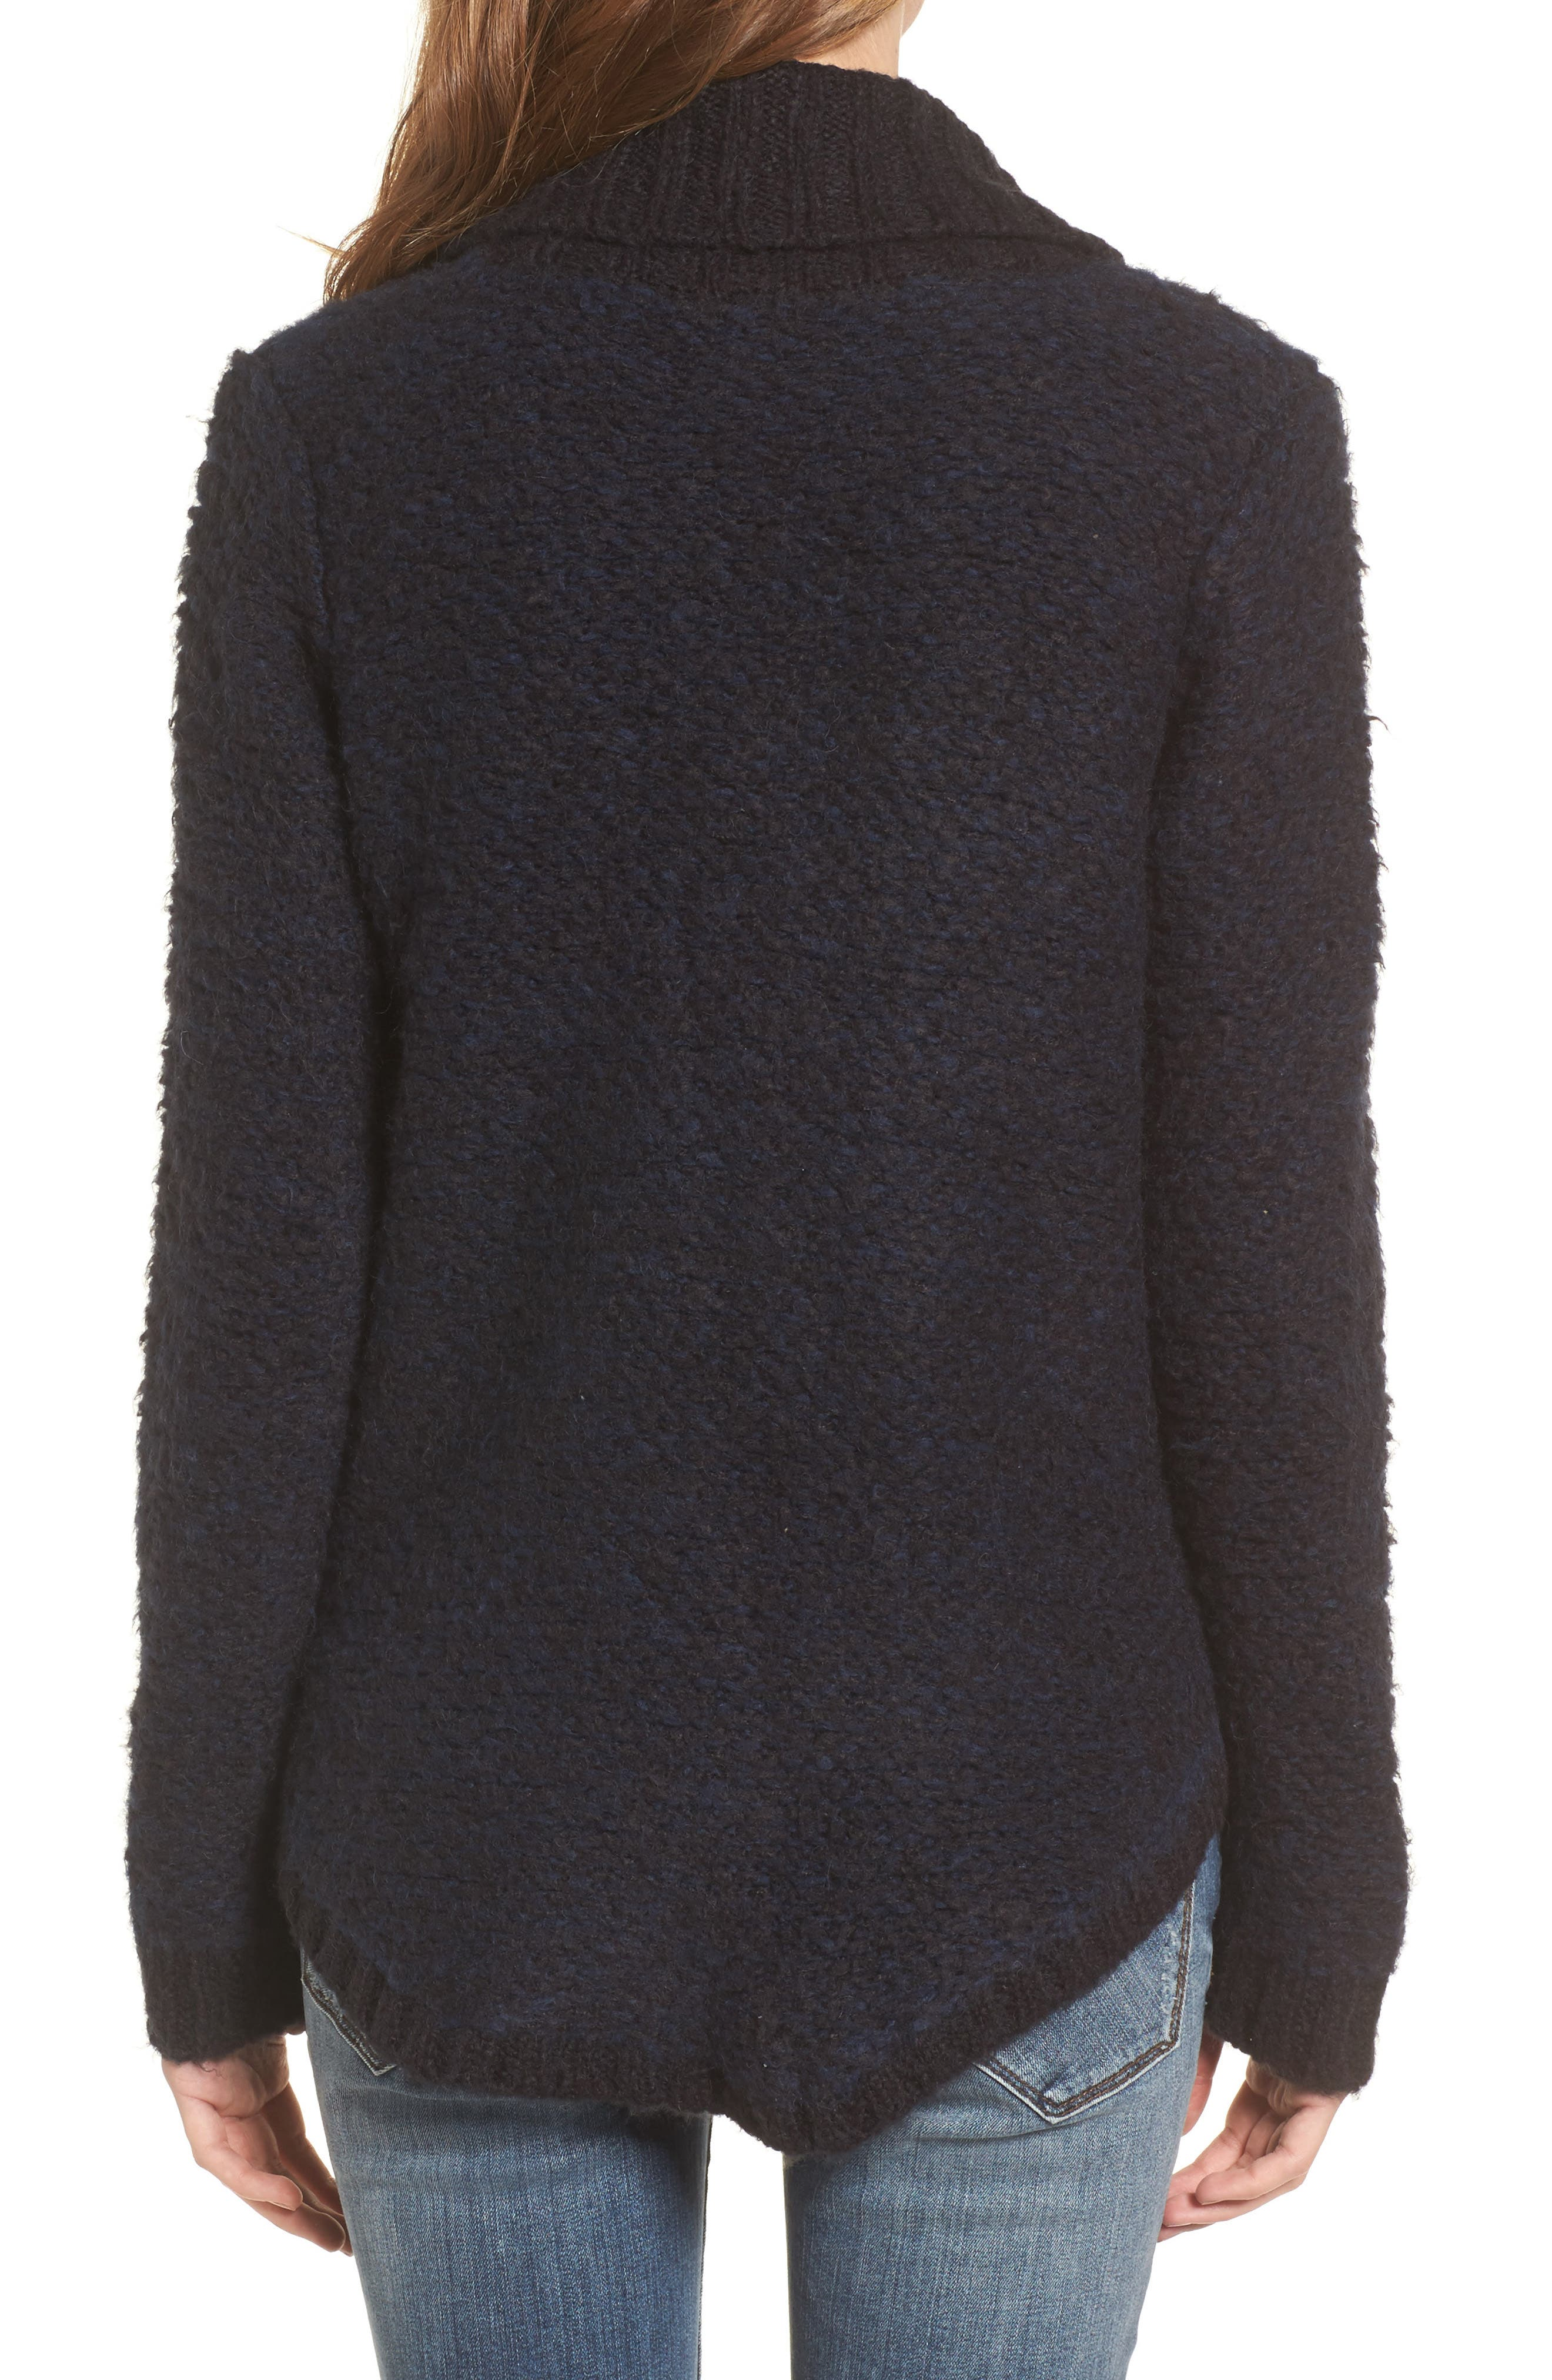 Kinks Turtleneck Sweater,                             Alternate thumbnail 3, color,